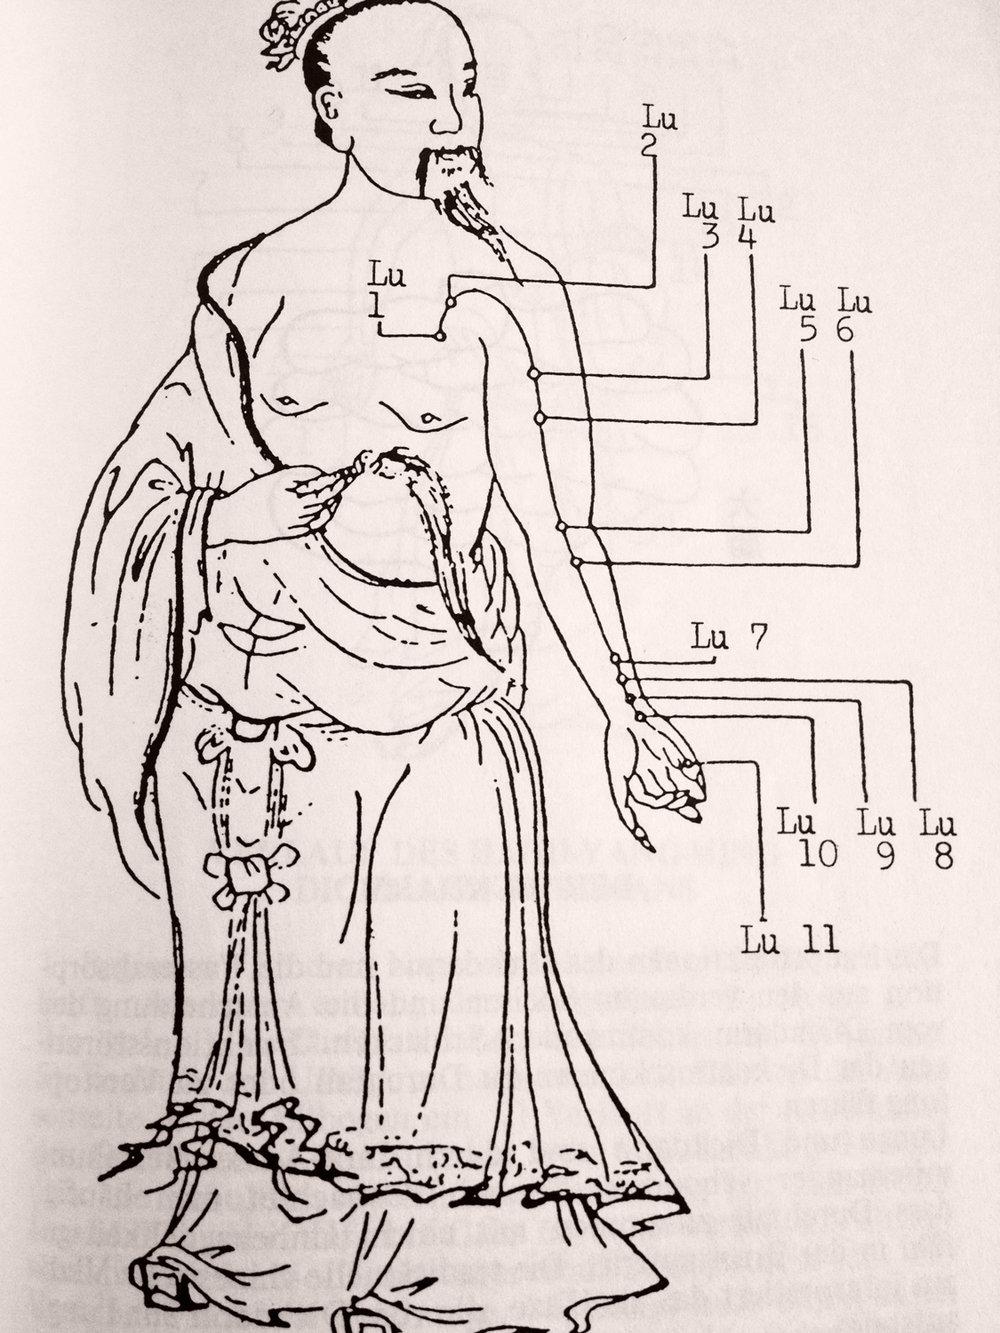 tcm-praxis-gioconda-baenziger-zurich-meridiane-1.jpg